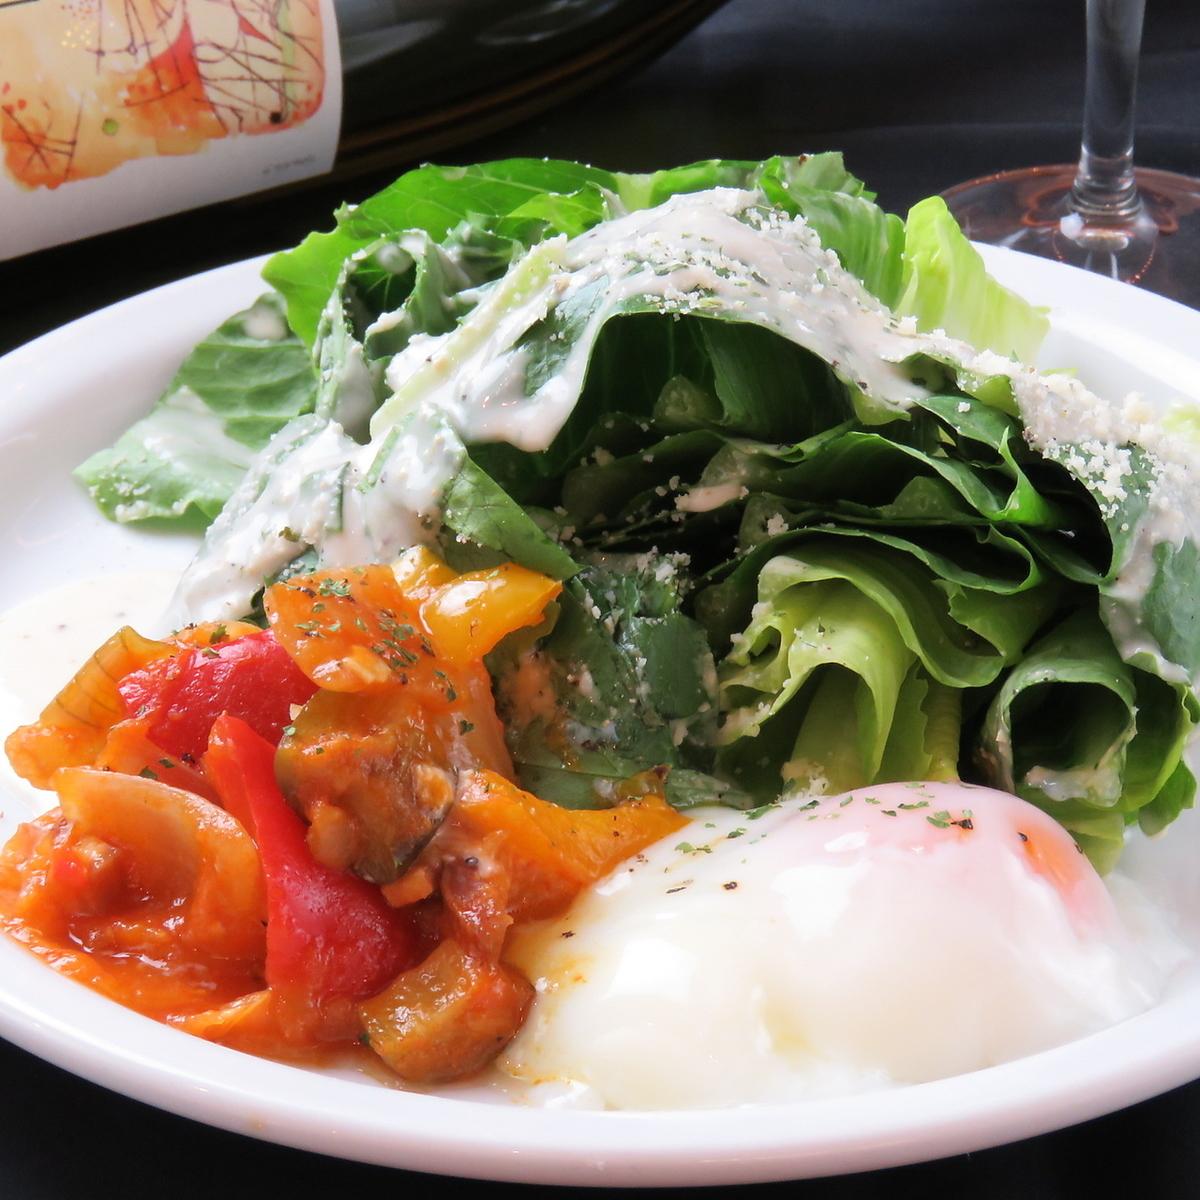 Romaine lettuce and Ratatouille caesar salad with warm balls